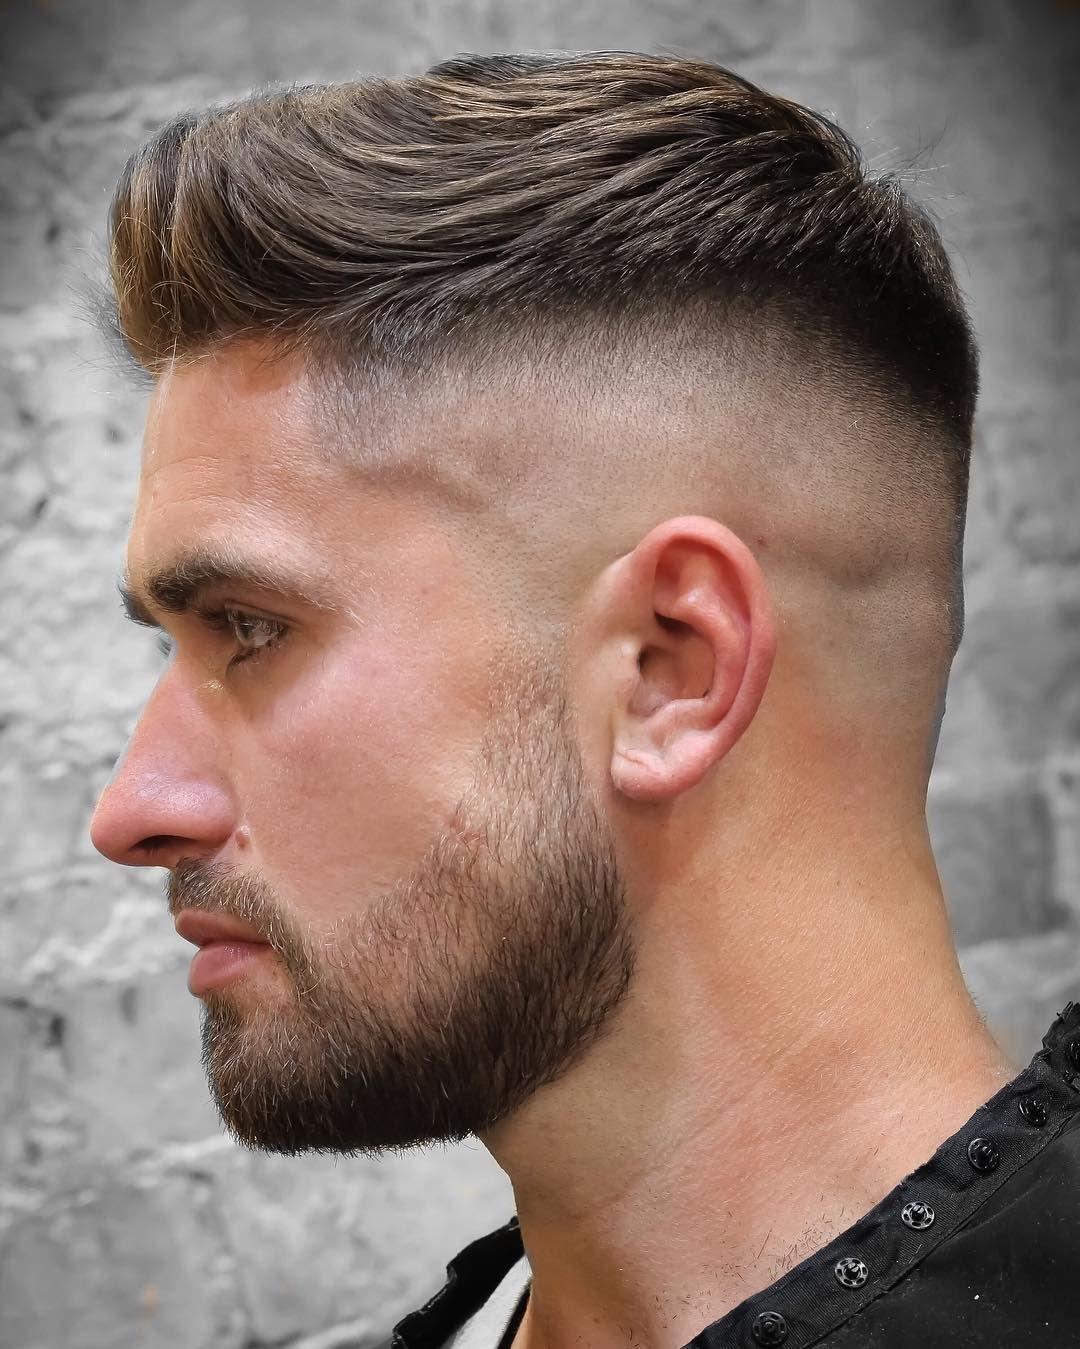 Mens hairstyles 2019  Hair styles in 2019  Quiff haircut